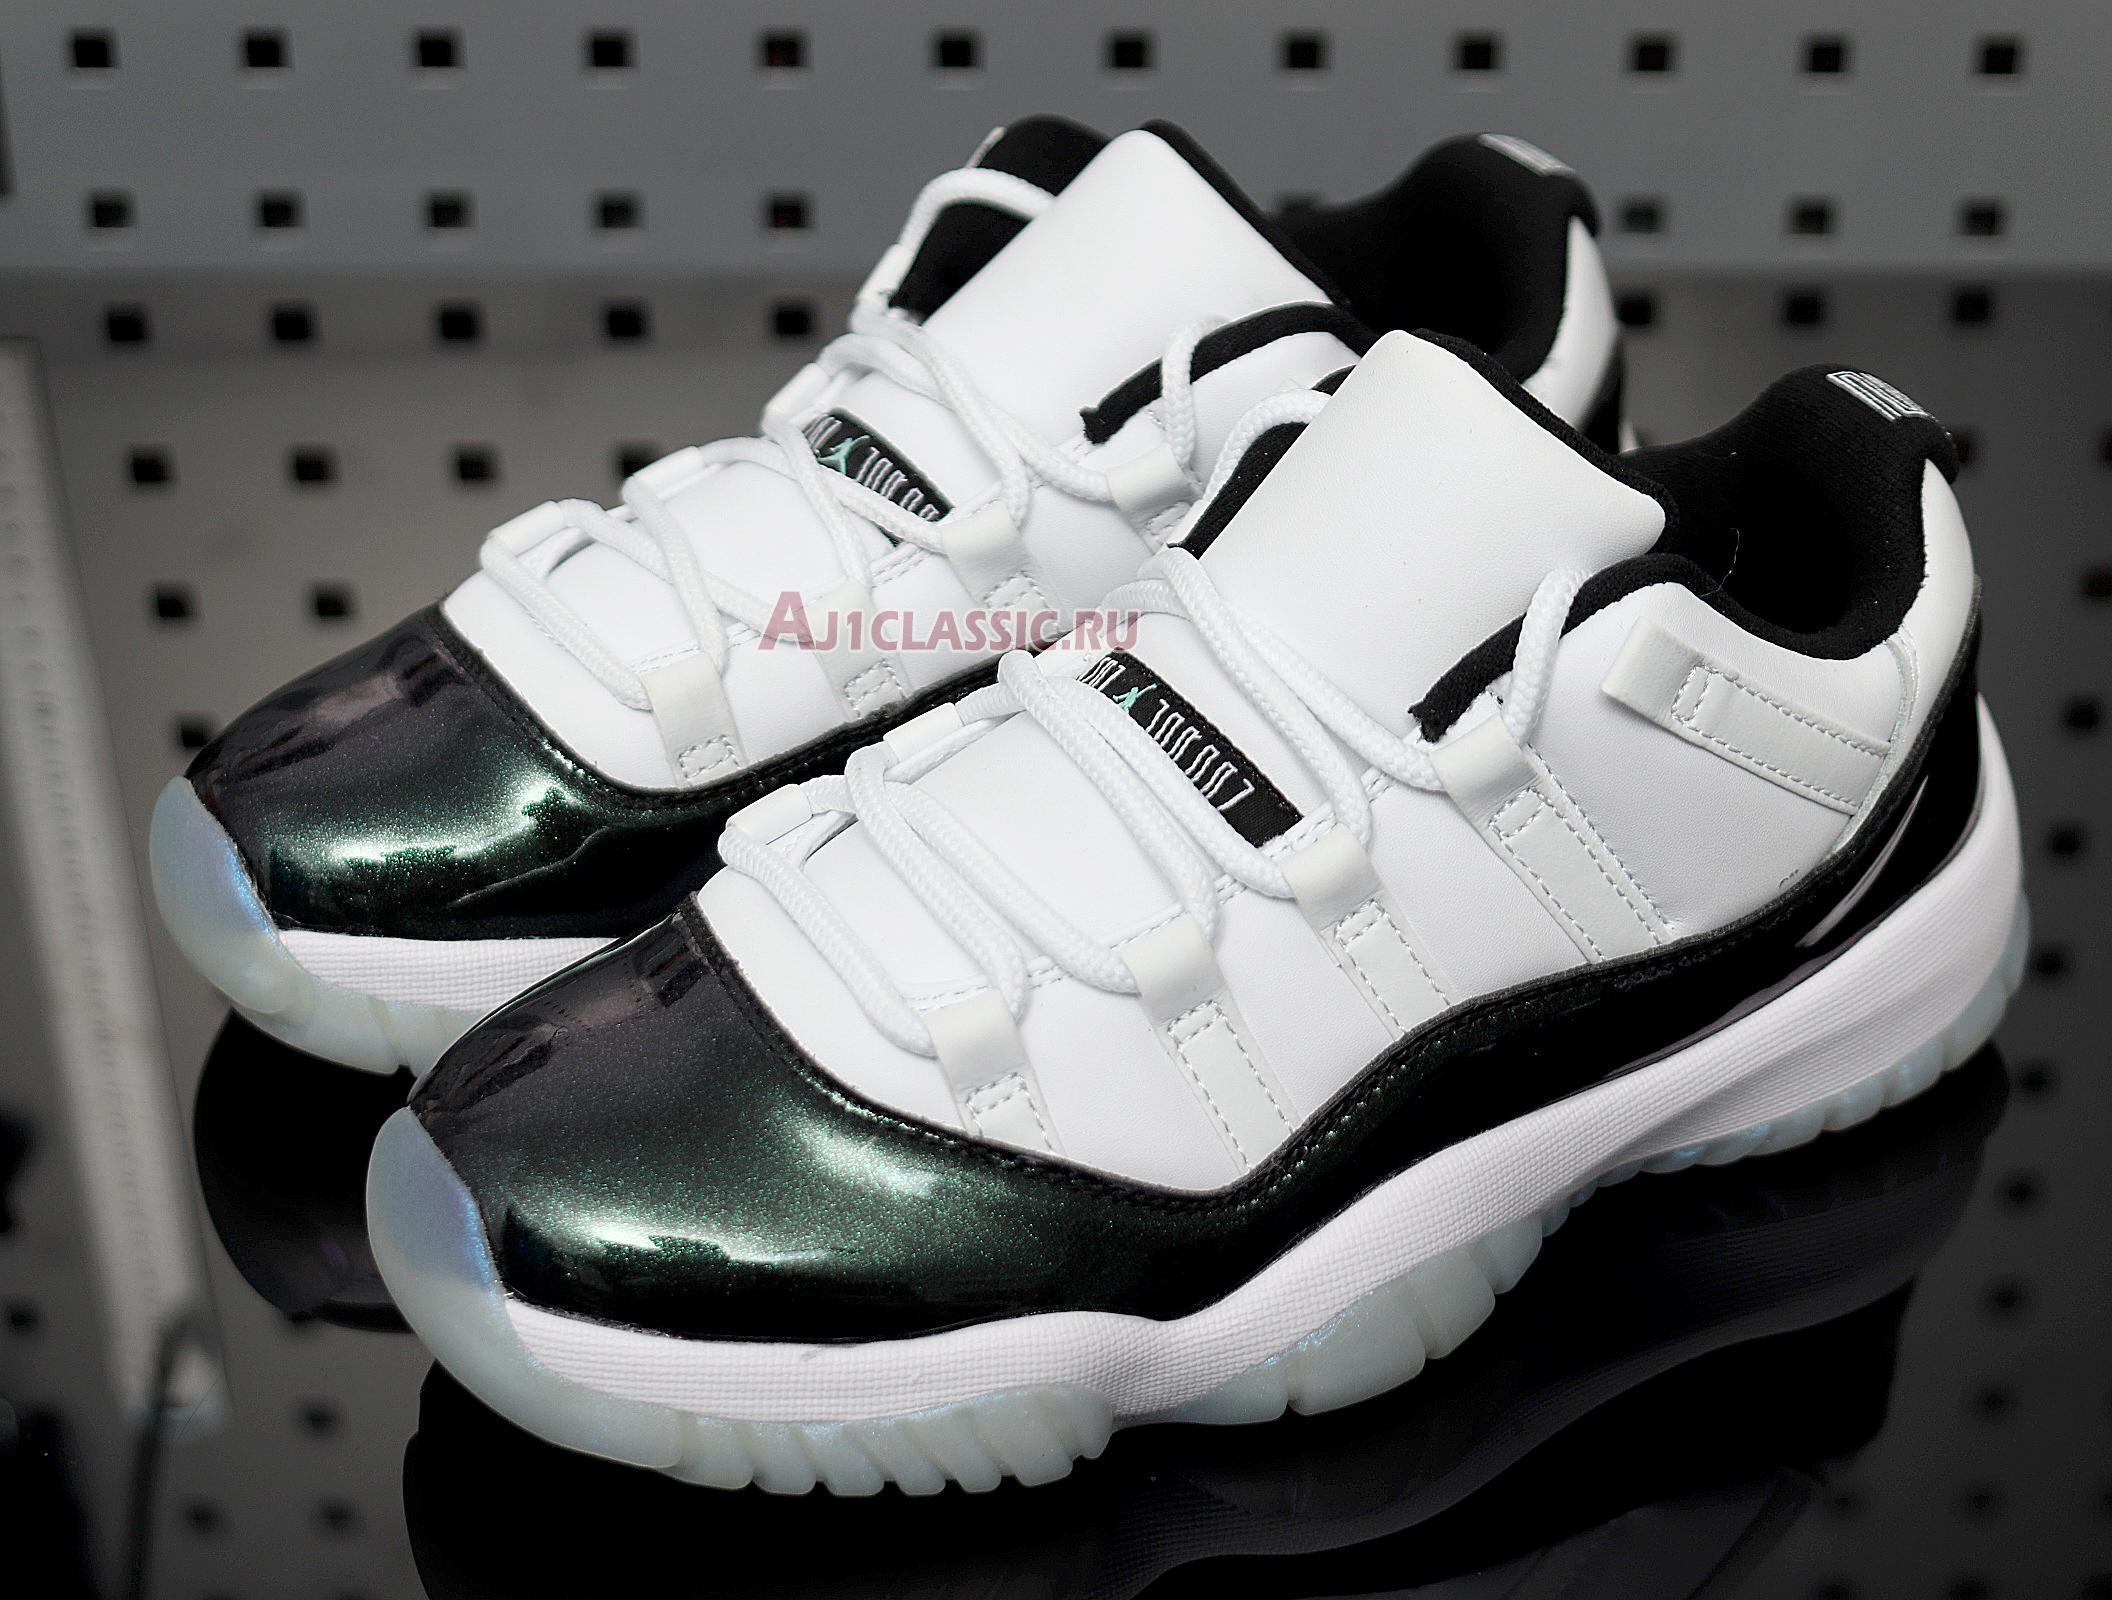 "Air Jordan 11 Retro Low ""Emerald"" 528895-145"